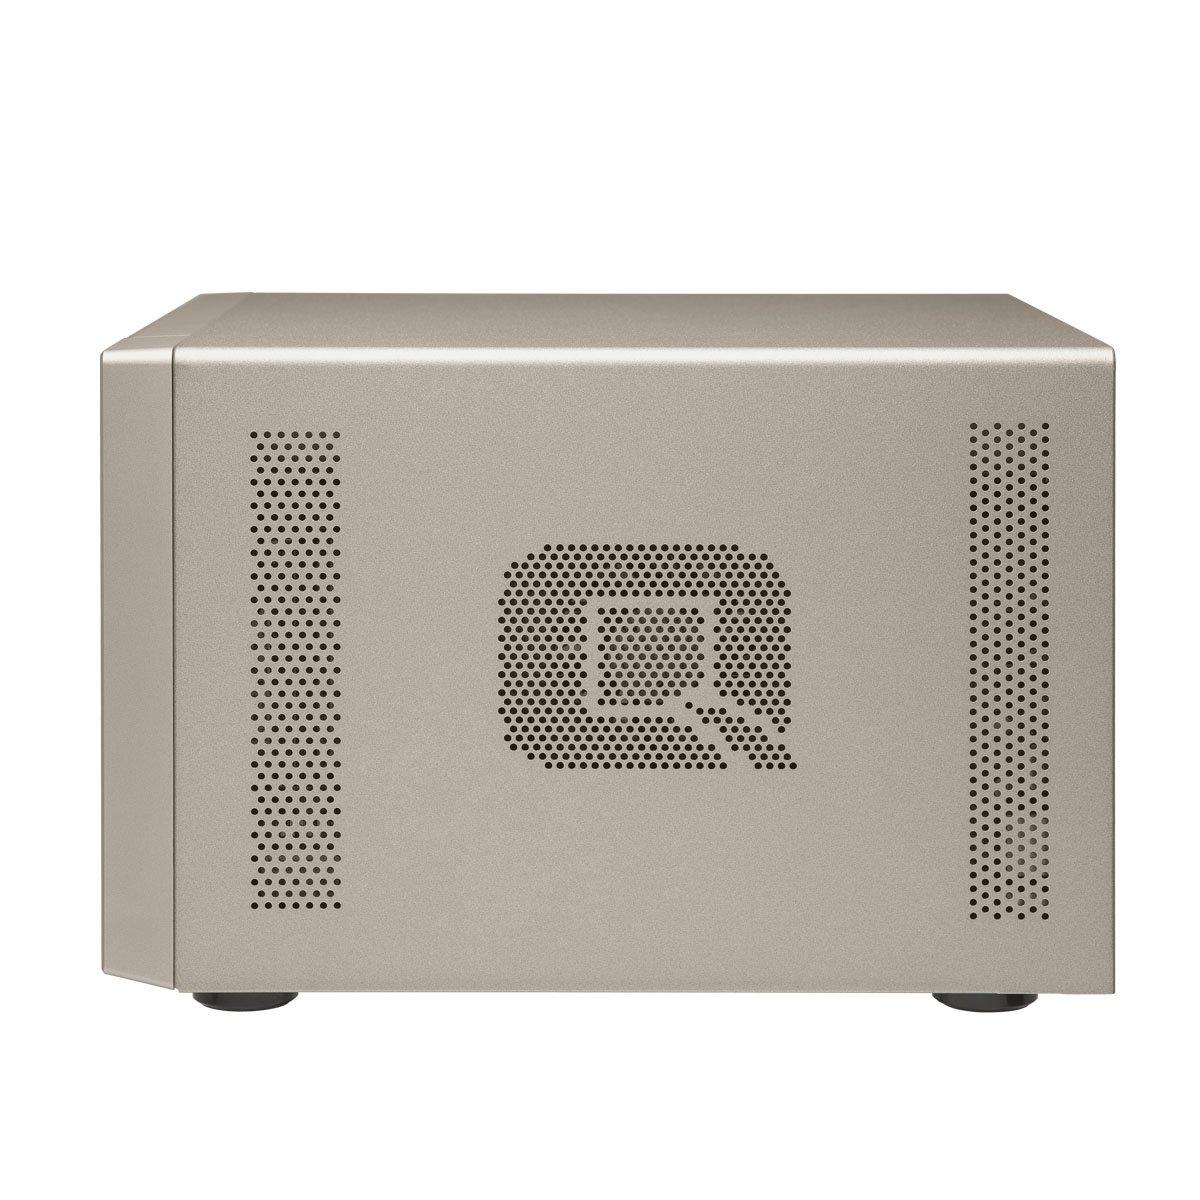 Qnap TVS-473-8G-US 4-bay NAS/iSCSI IP-SAN, AMD R series Quad-core 2.1GHz, 8GB RAM, 10G-ready by QNAP (Image #3)